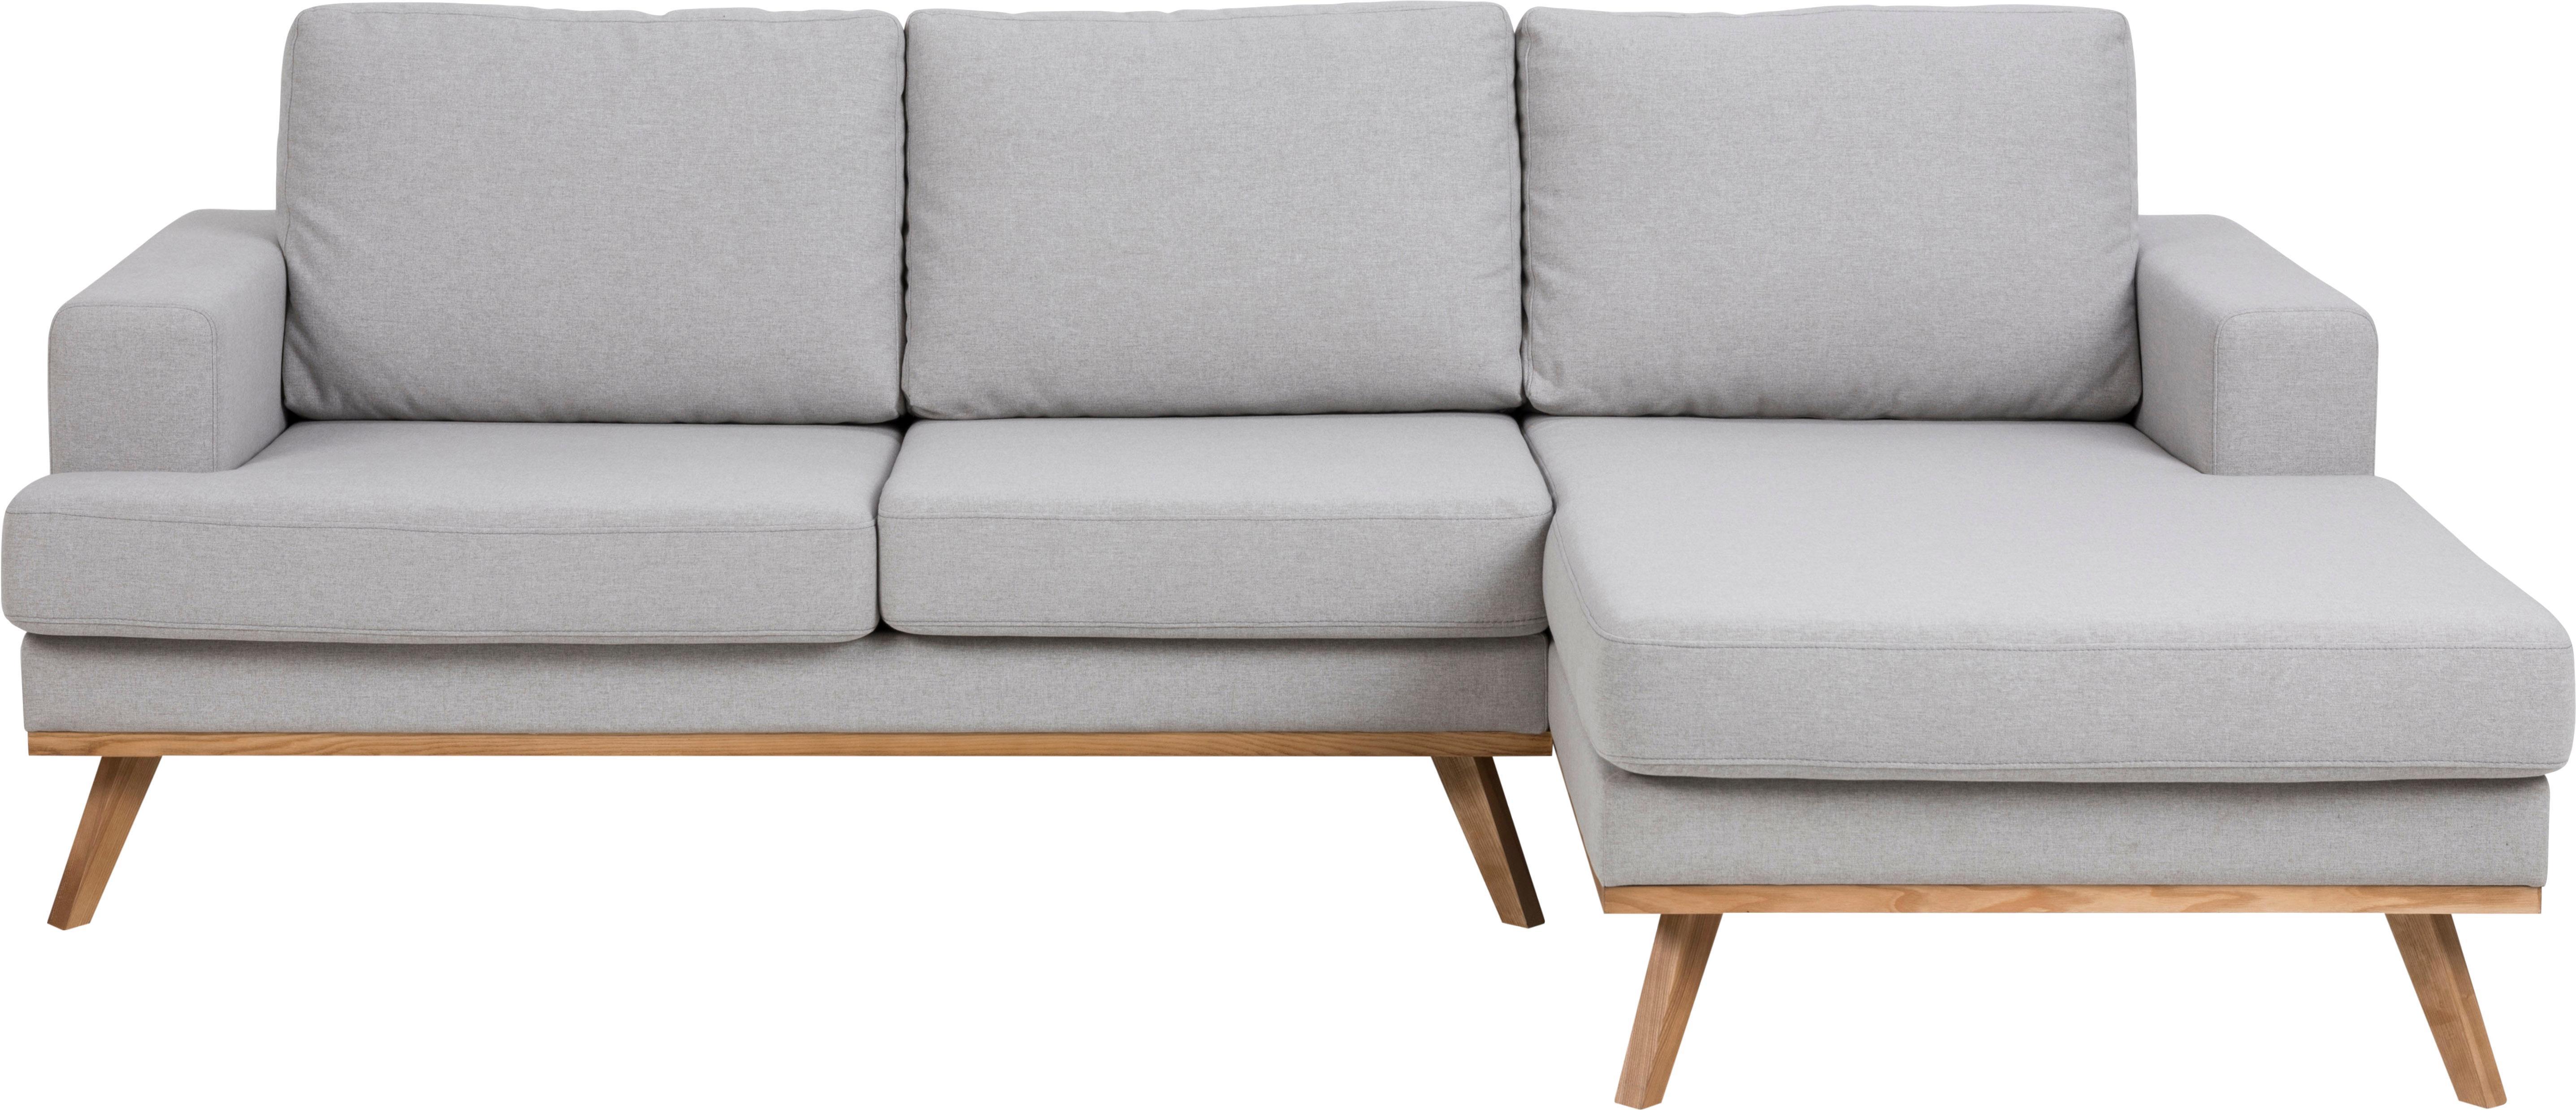 Ecksofa Norwich, Bezug: Polyester, Beine: Buchenholz, gebeizt, Webstoff Hellgrau, B 233 x T 148 cm